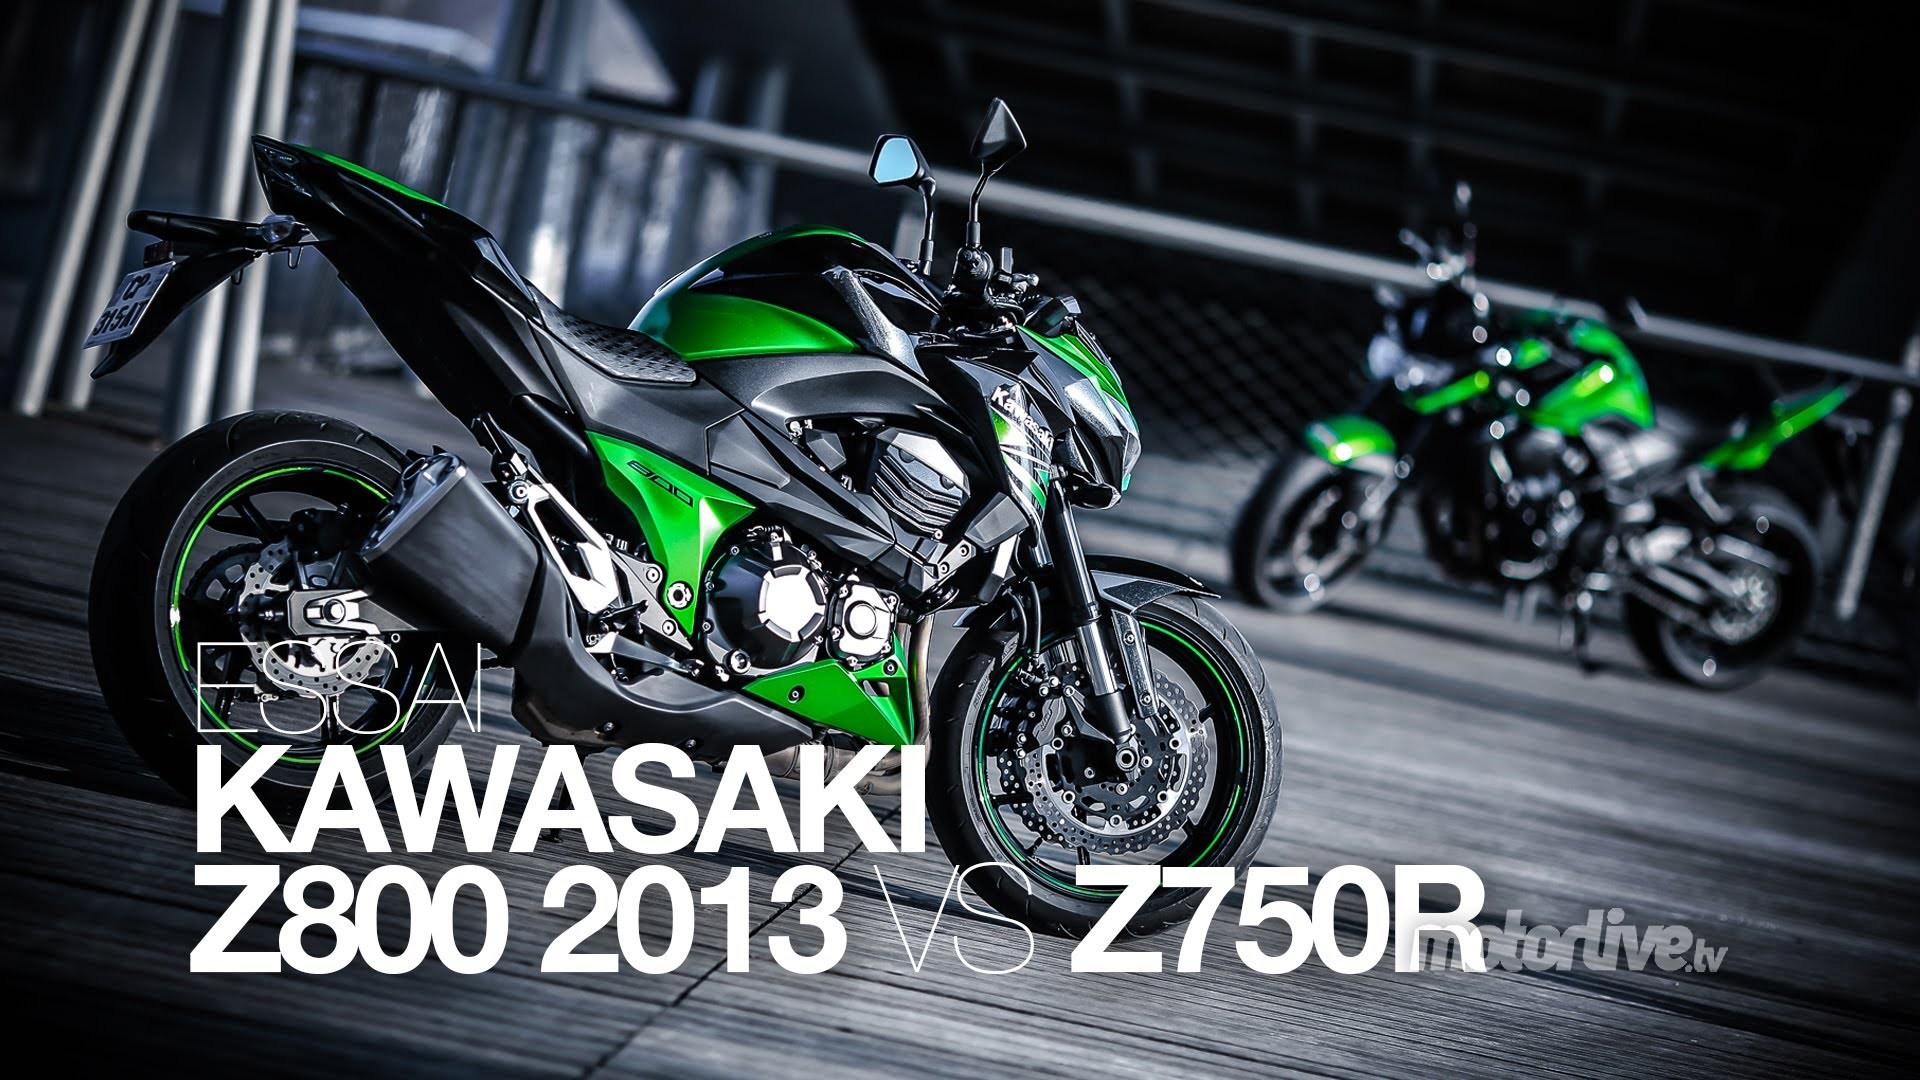 Обои Kawasaki, Мотоцикл, z800. Мотоциклы foto 10